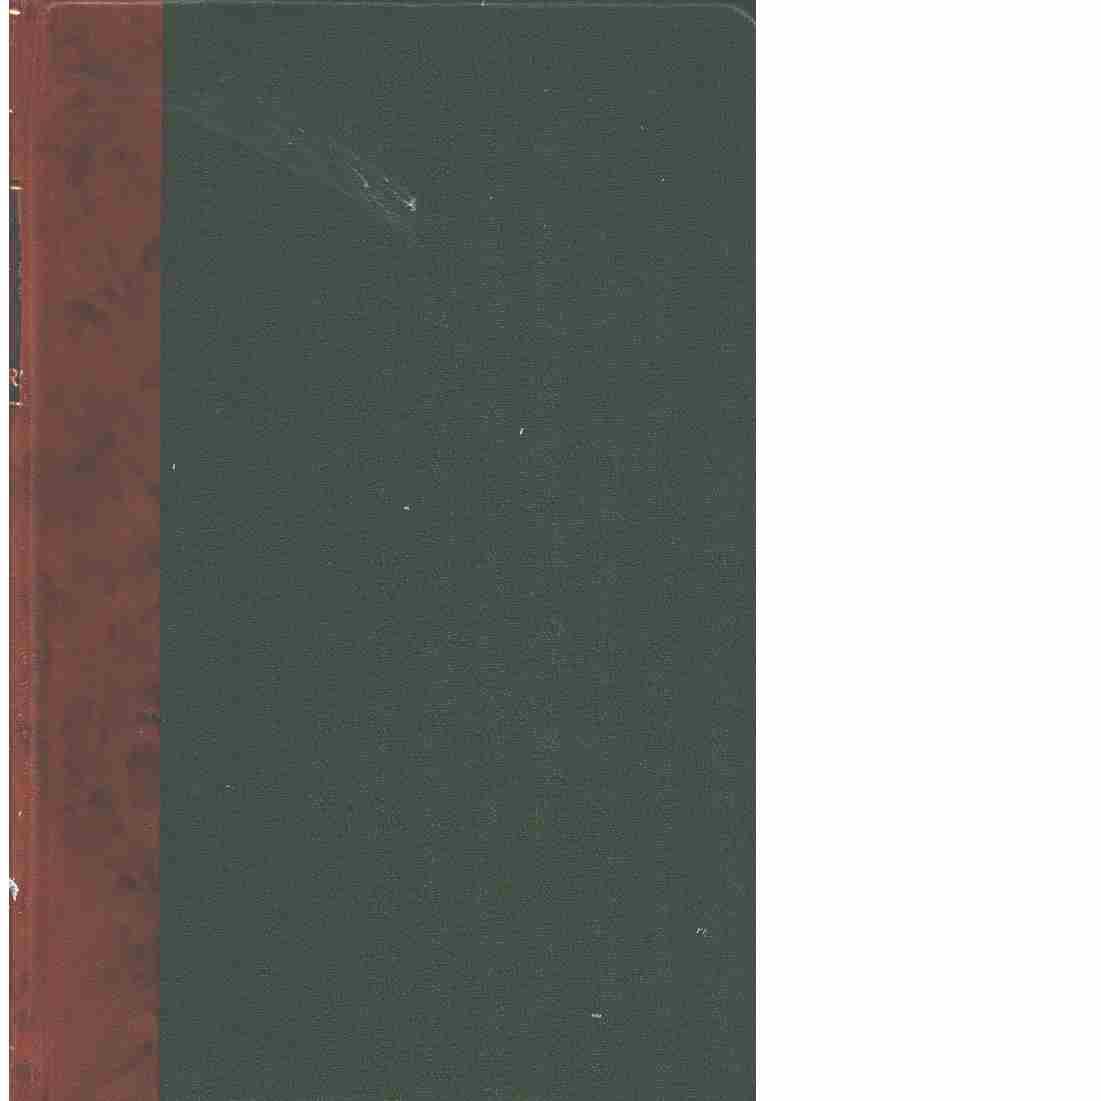 P.A.N. : vers och prosa - Red.